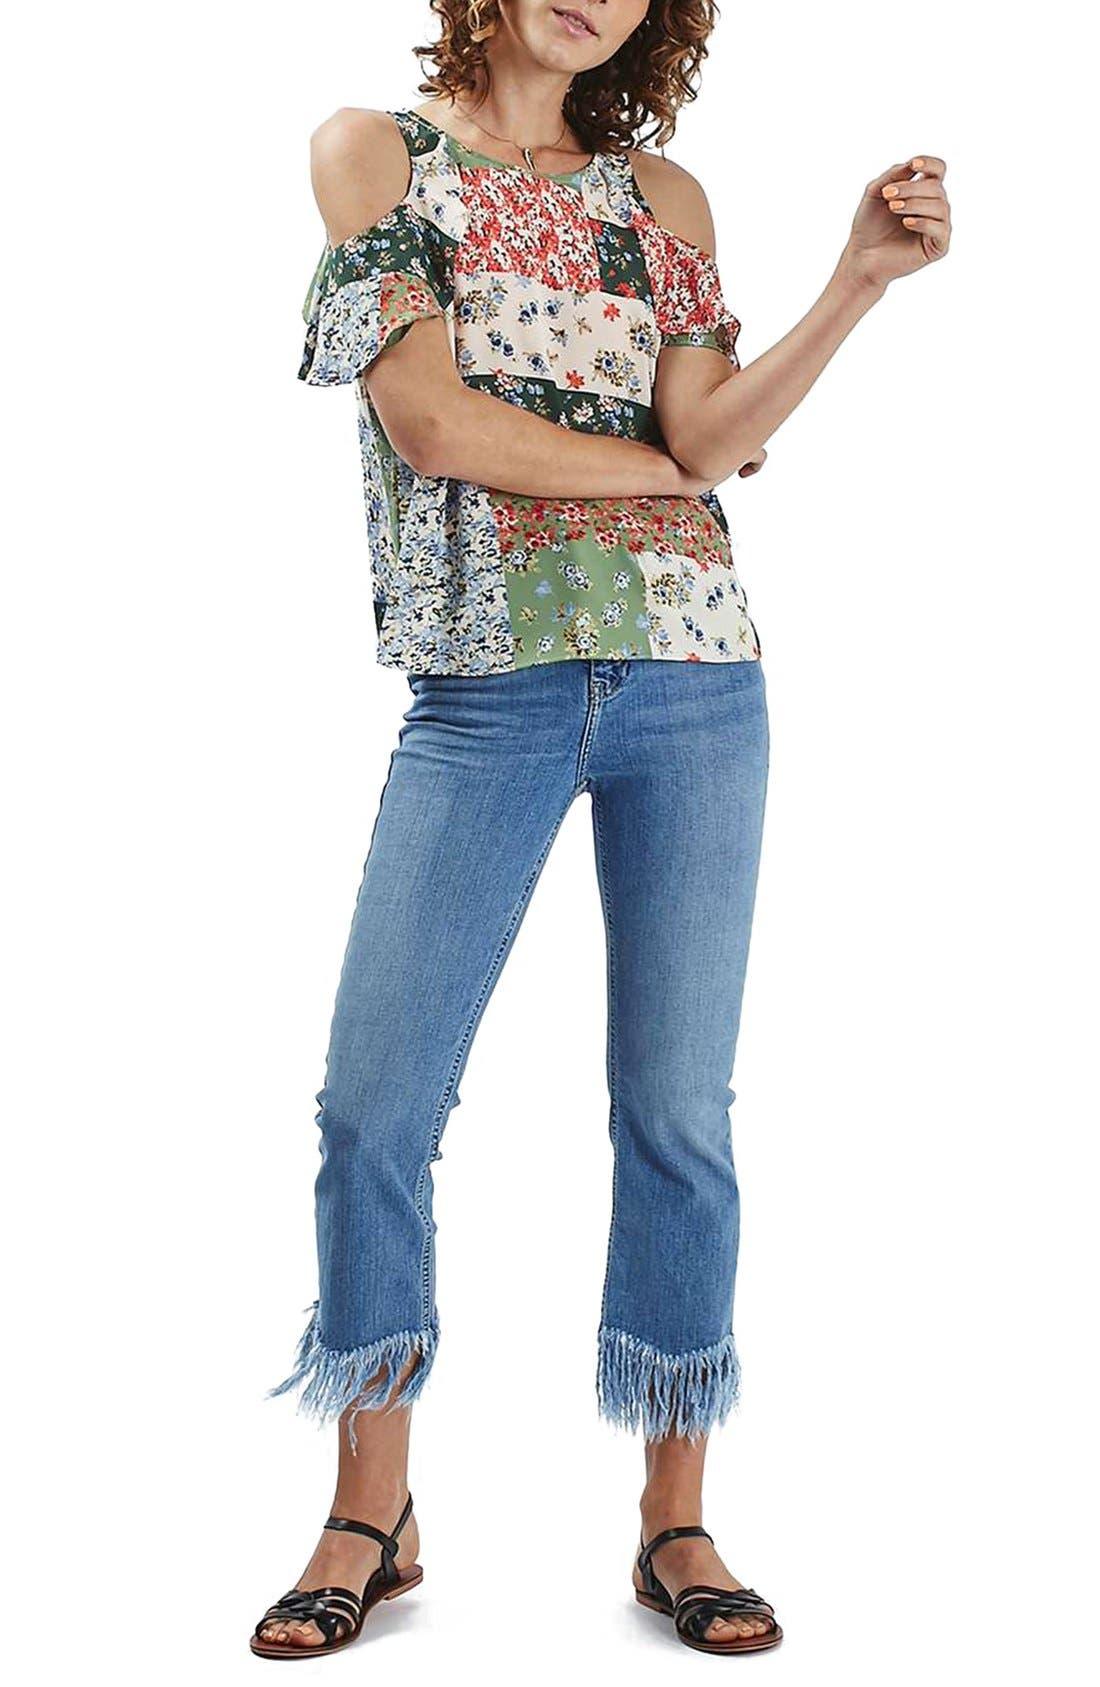 Alternate Image 1 Selected - Topshop Patchwork Floral Ruffle Cold Shoulder Blouse